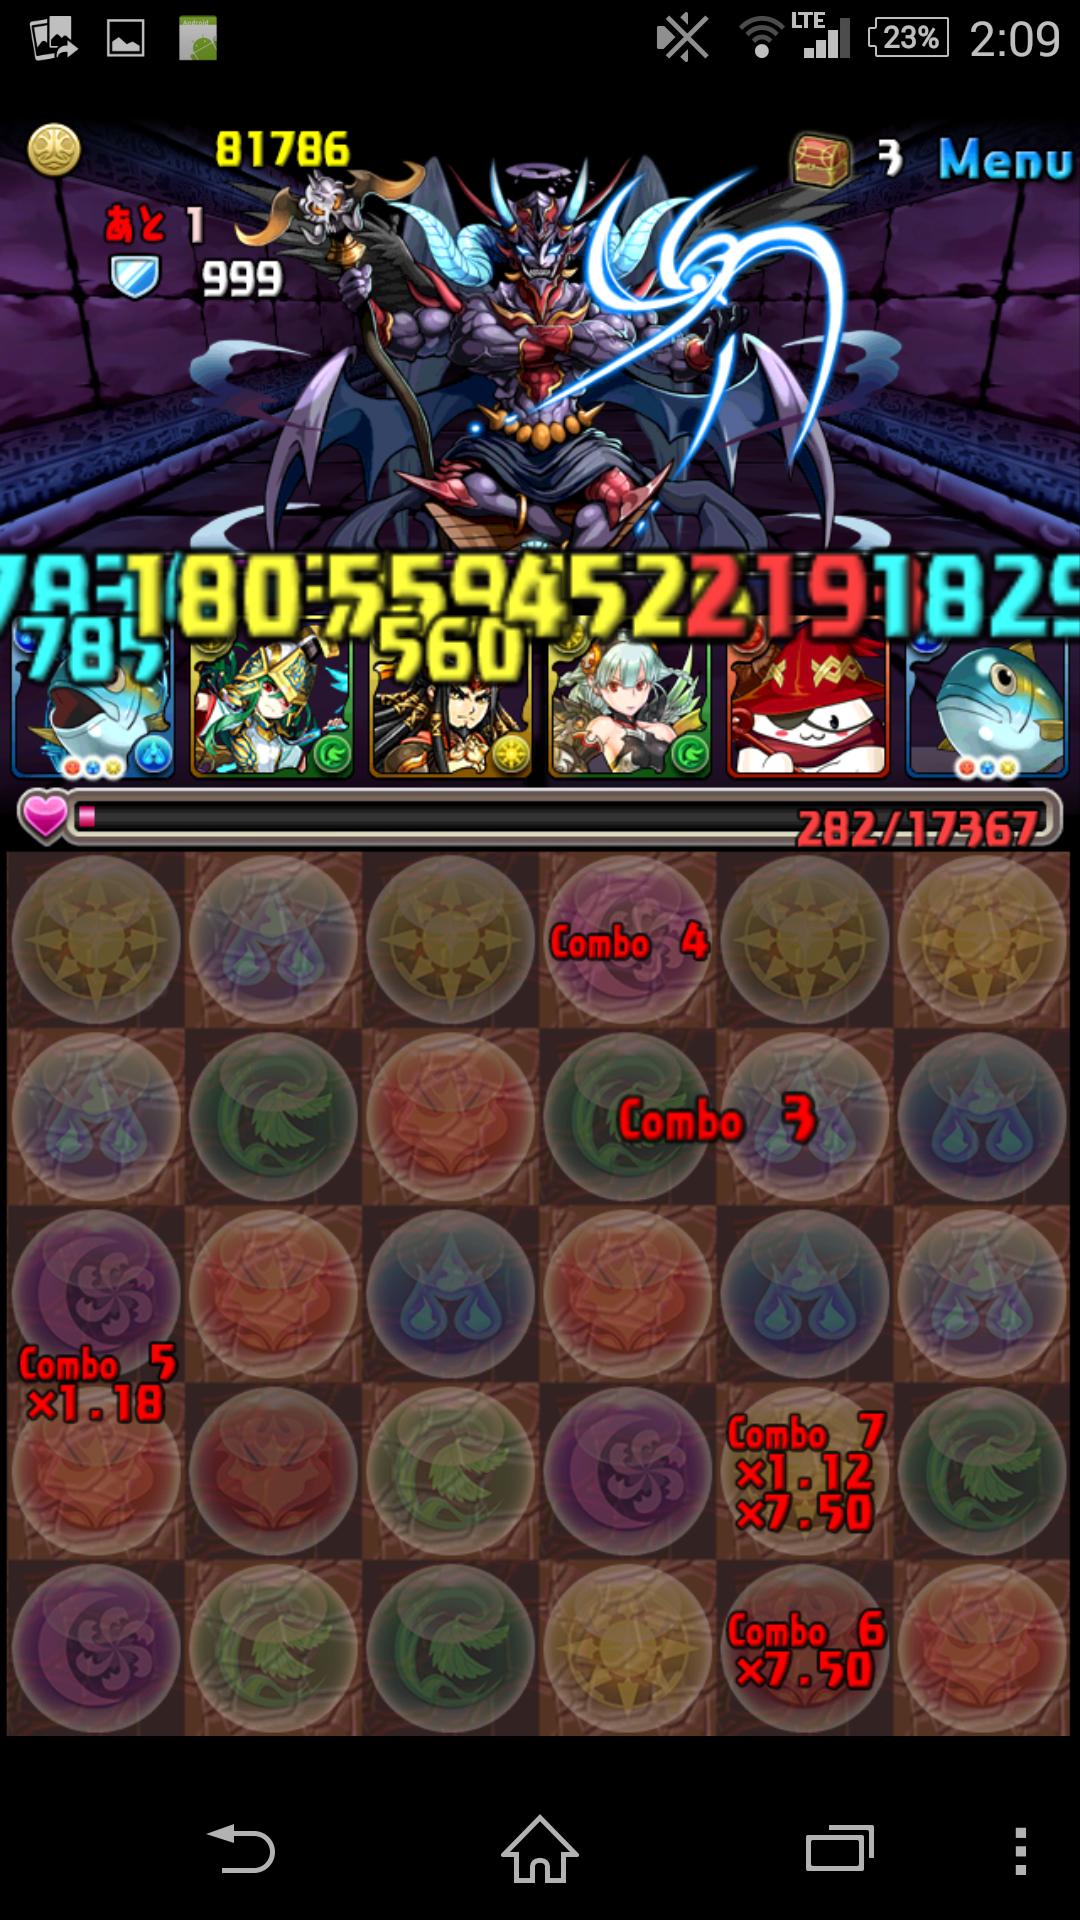 Screenshot_2014-09-30-02-09-06.png